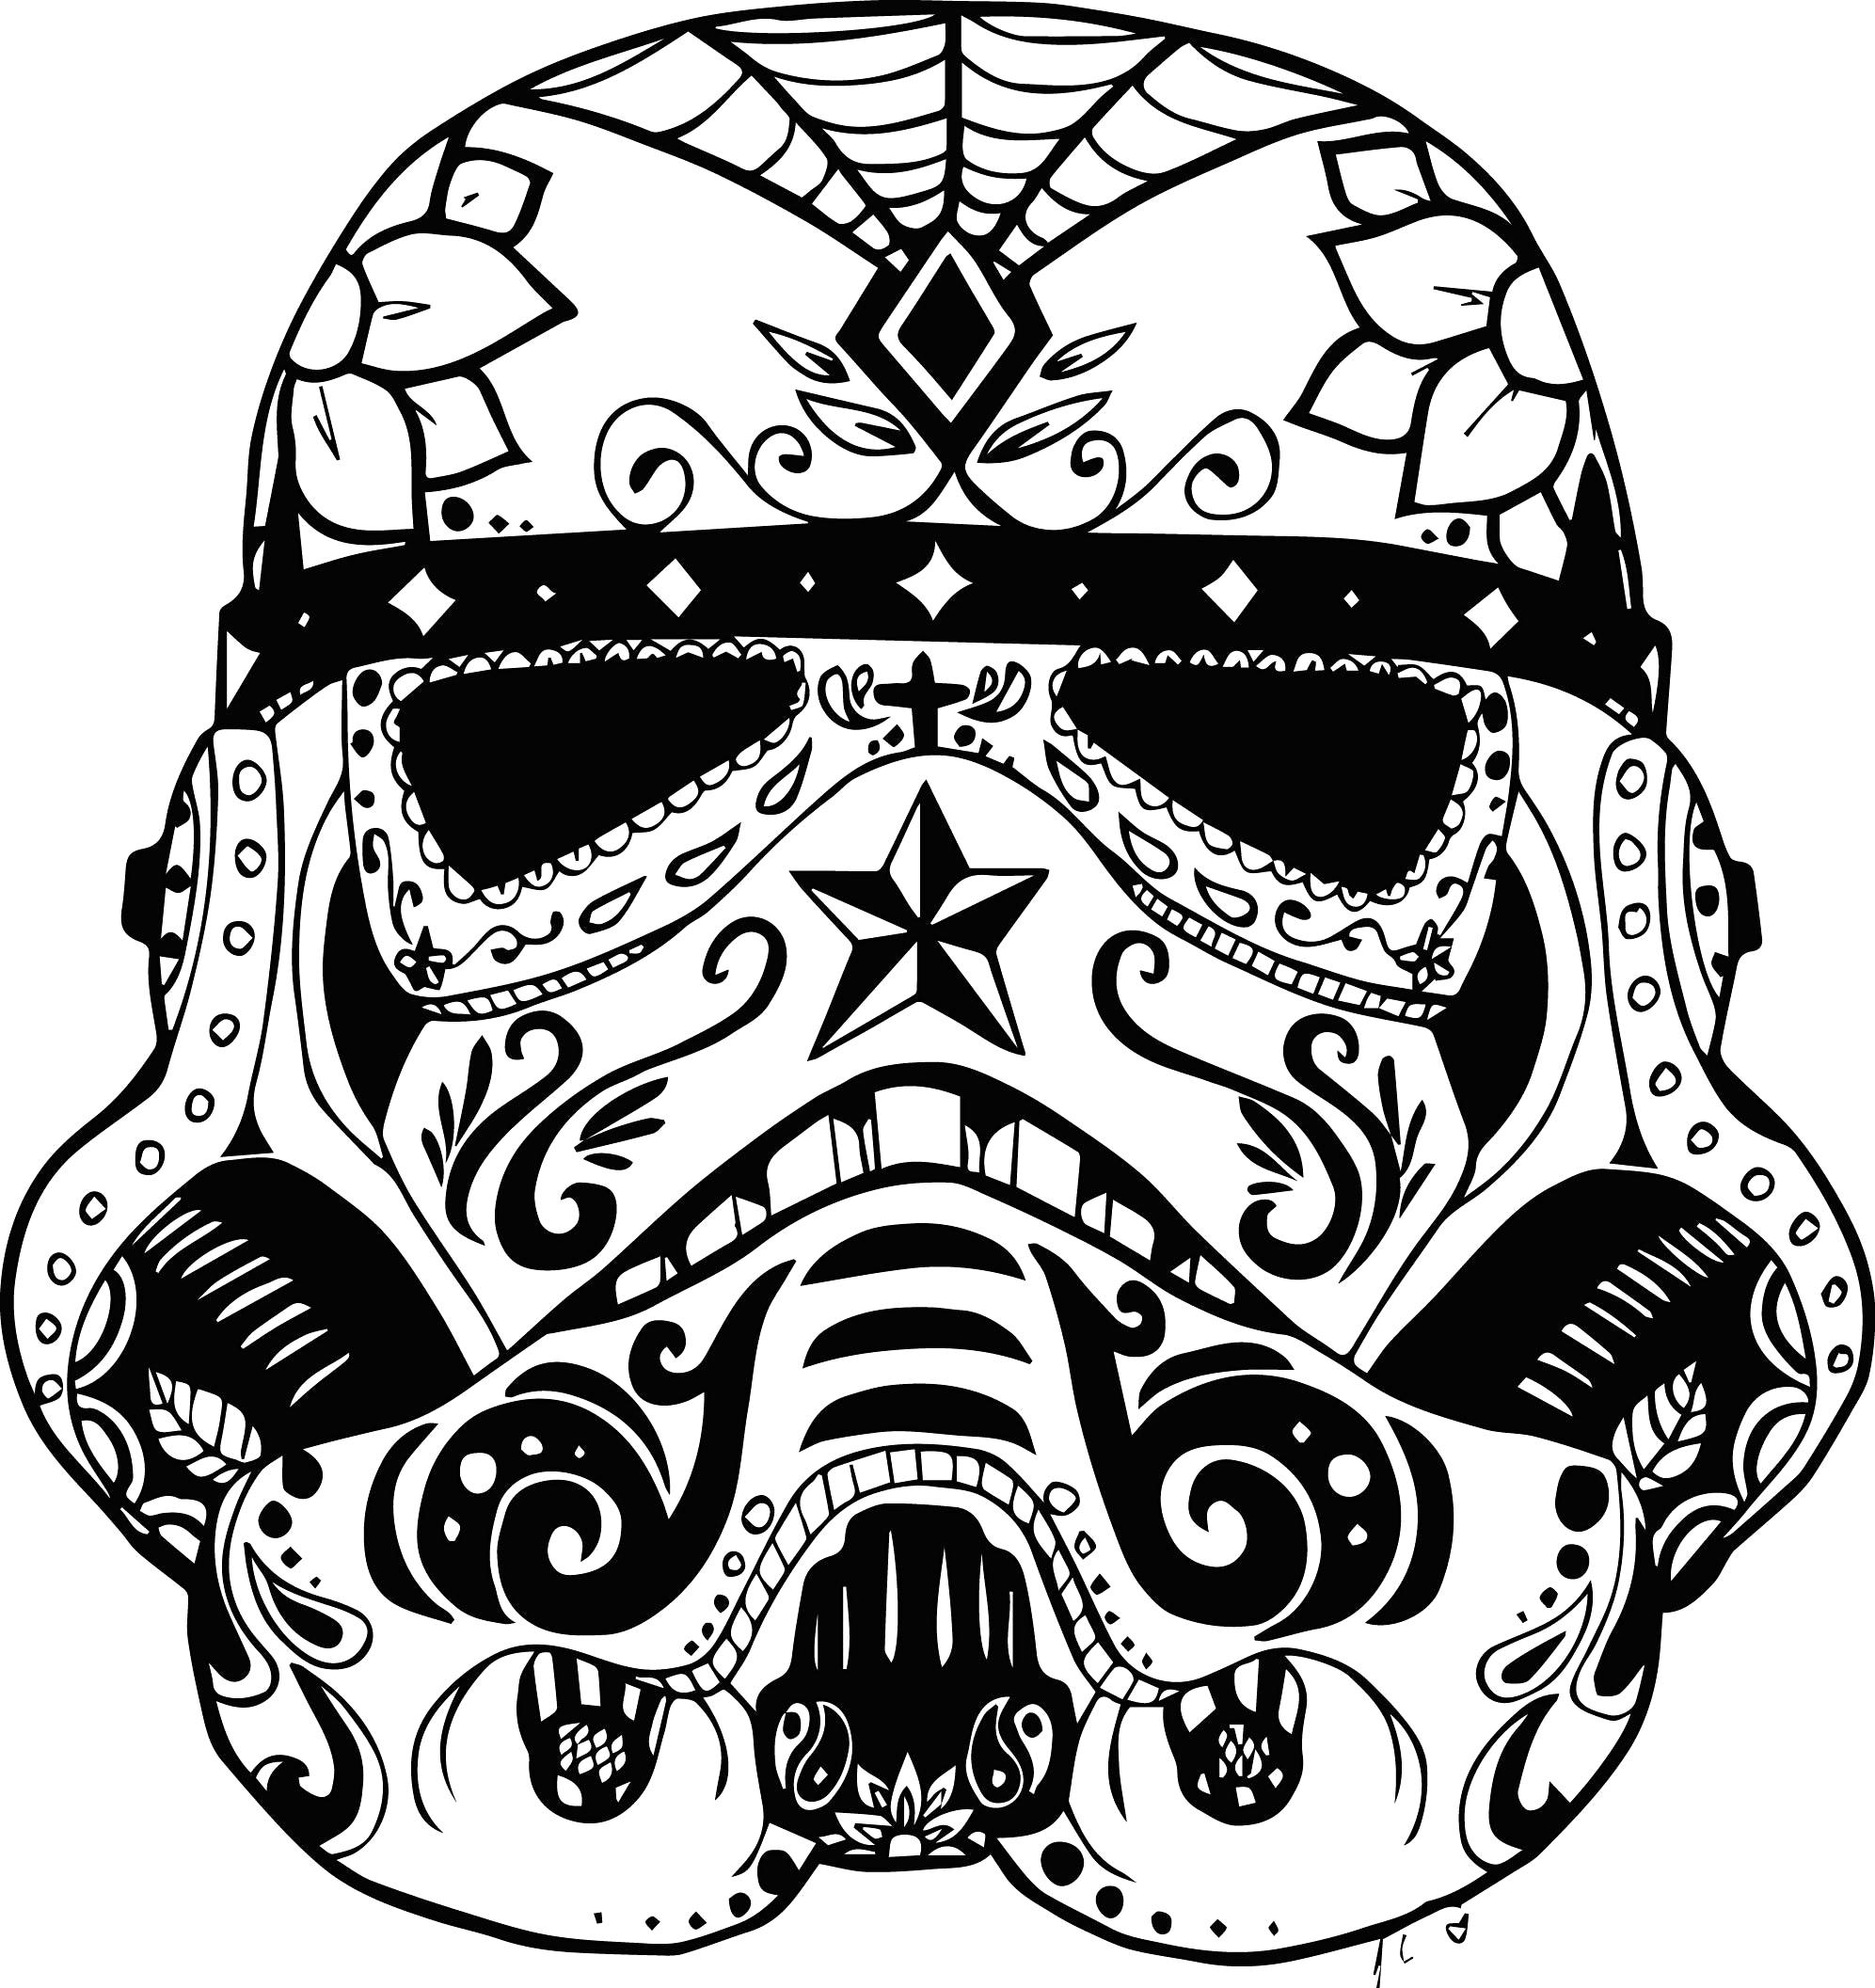 Berühmt Sugar Skull Tattoo Malvorlagen Fotos - Beispiel ...